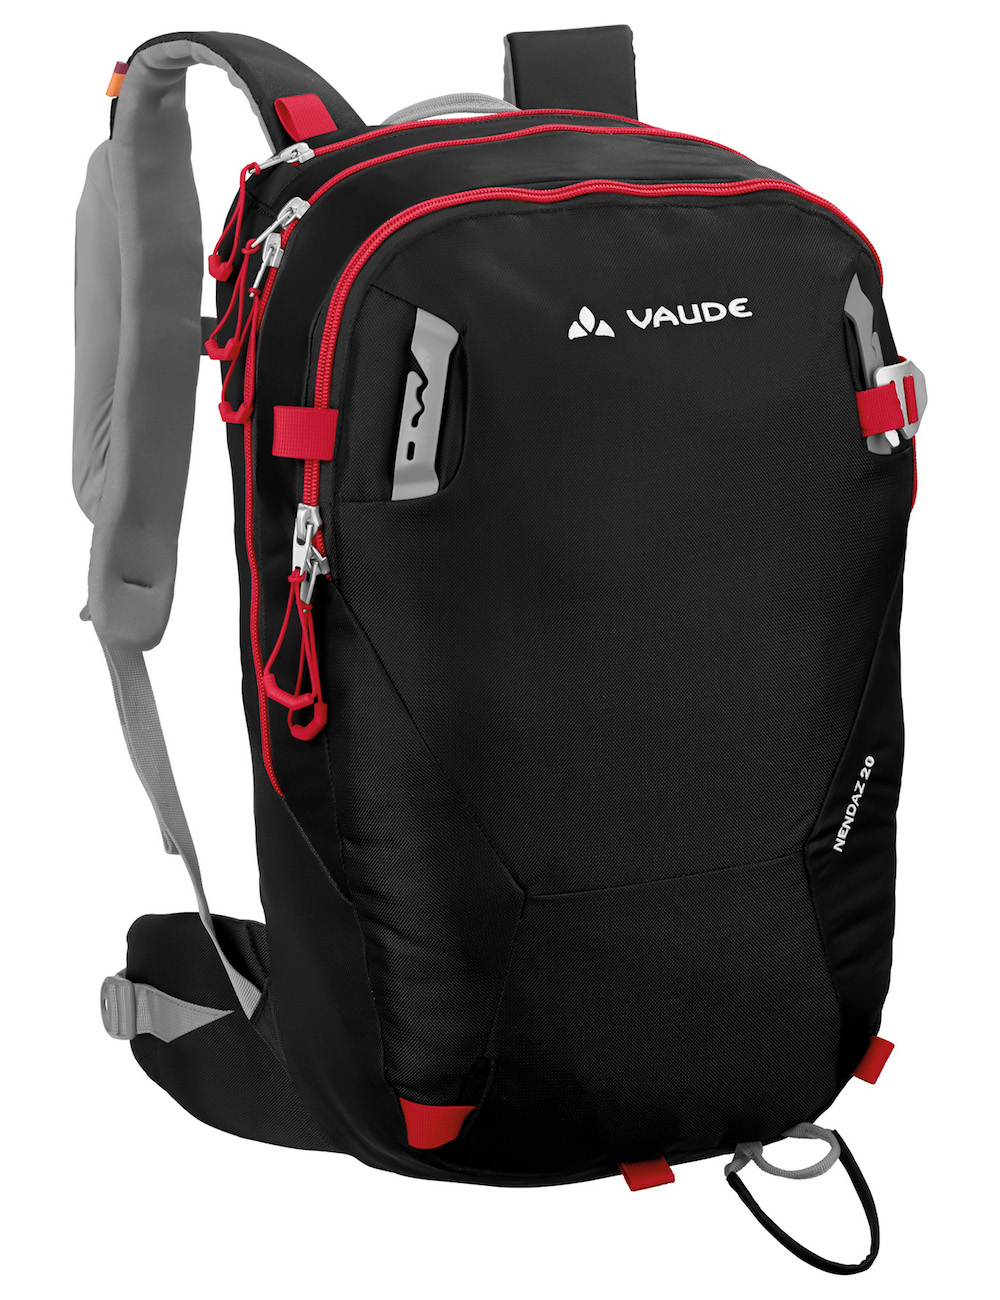 Vaude - Nendaz 20 - Ski Touring backpack